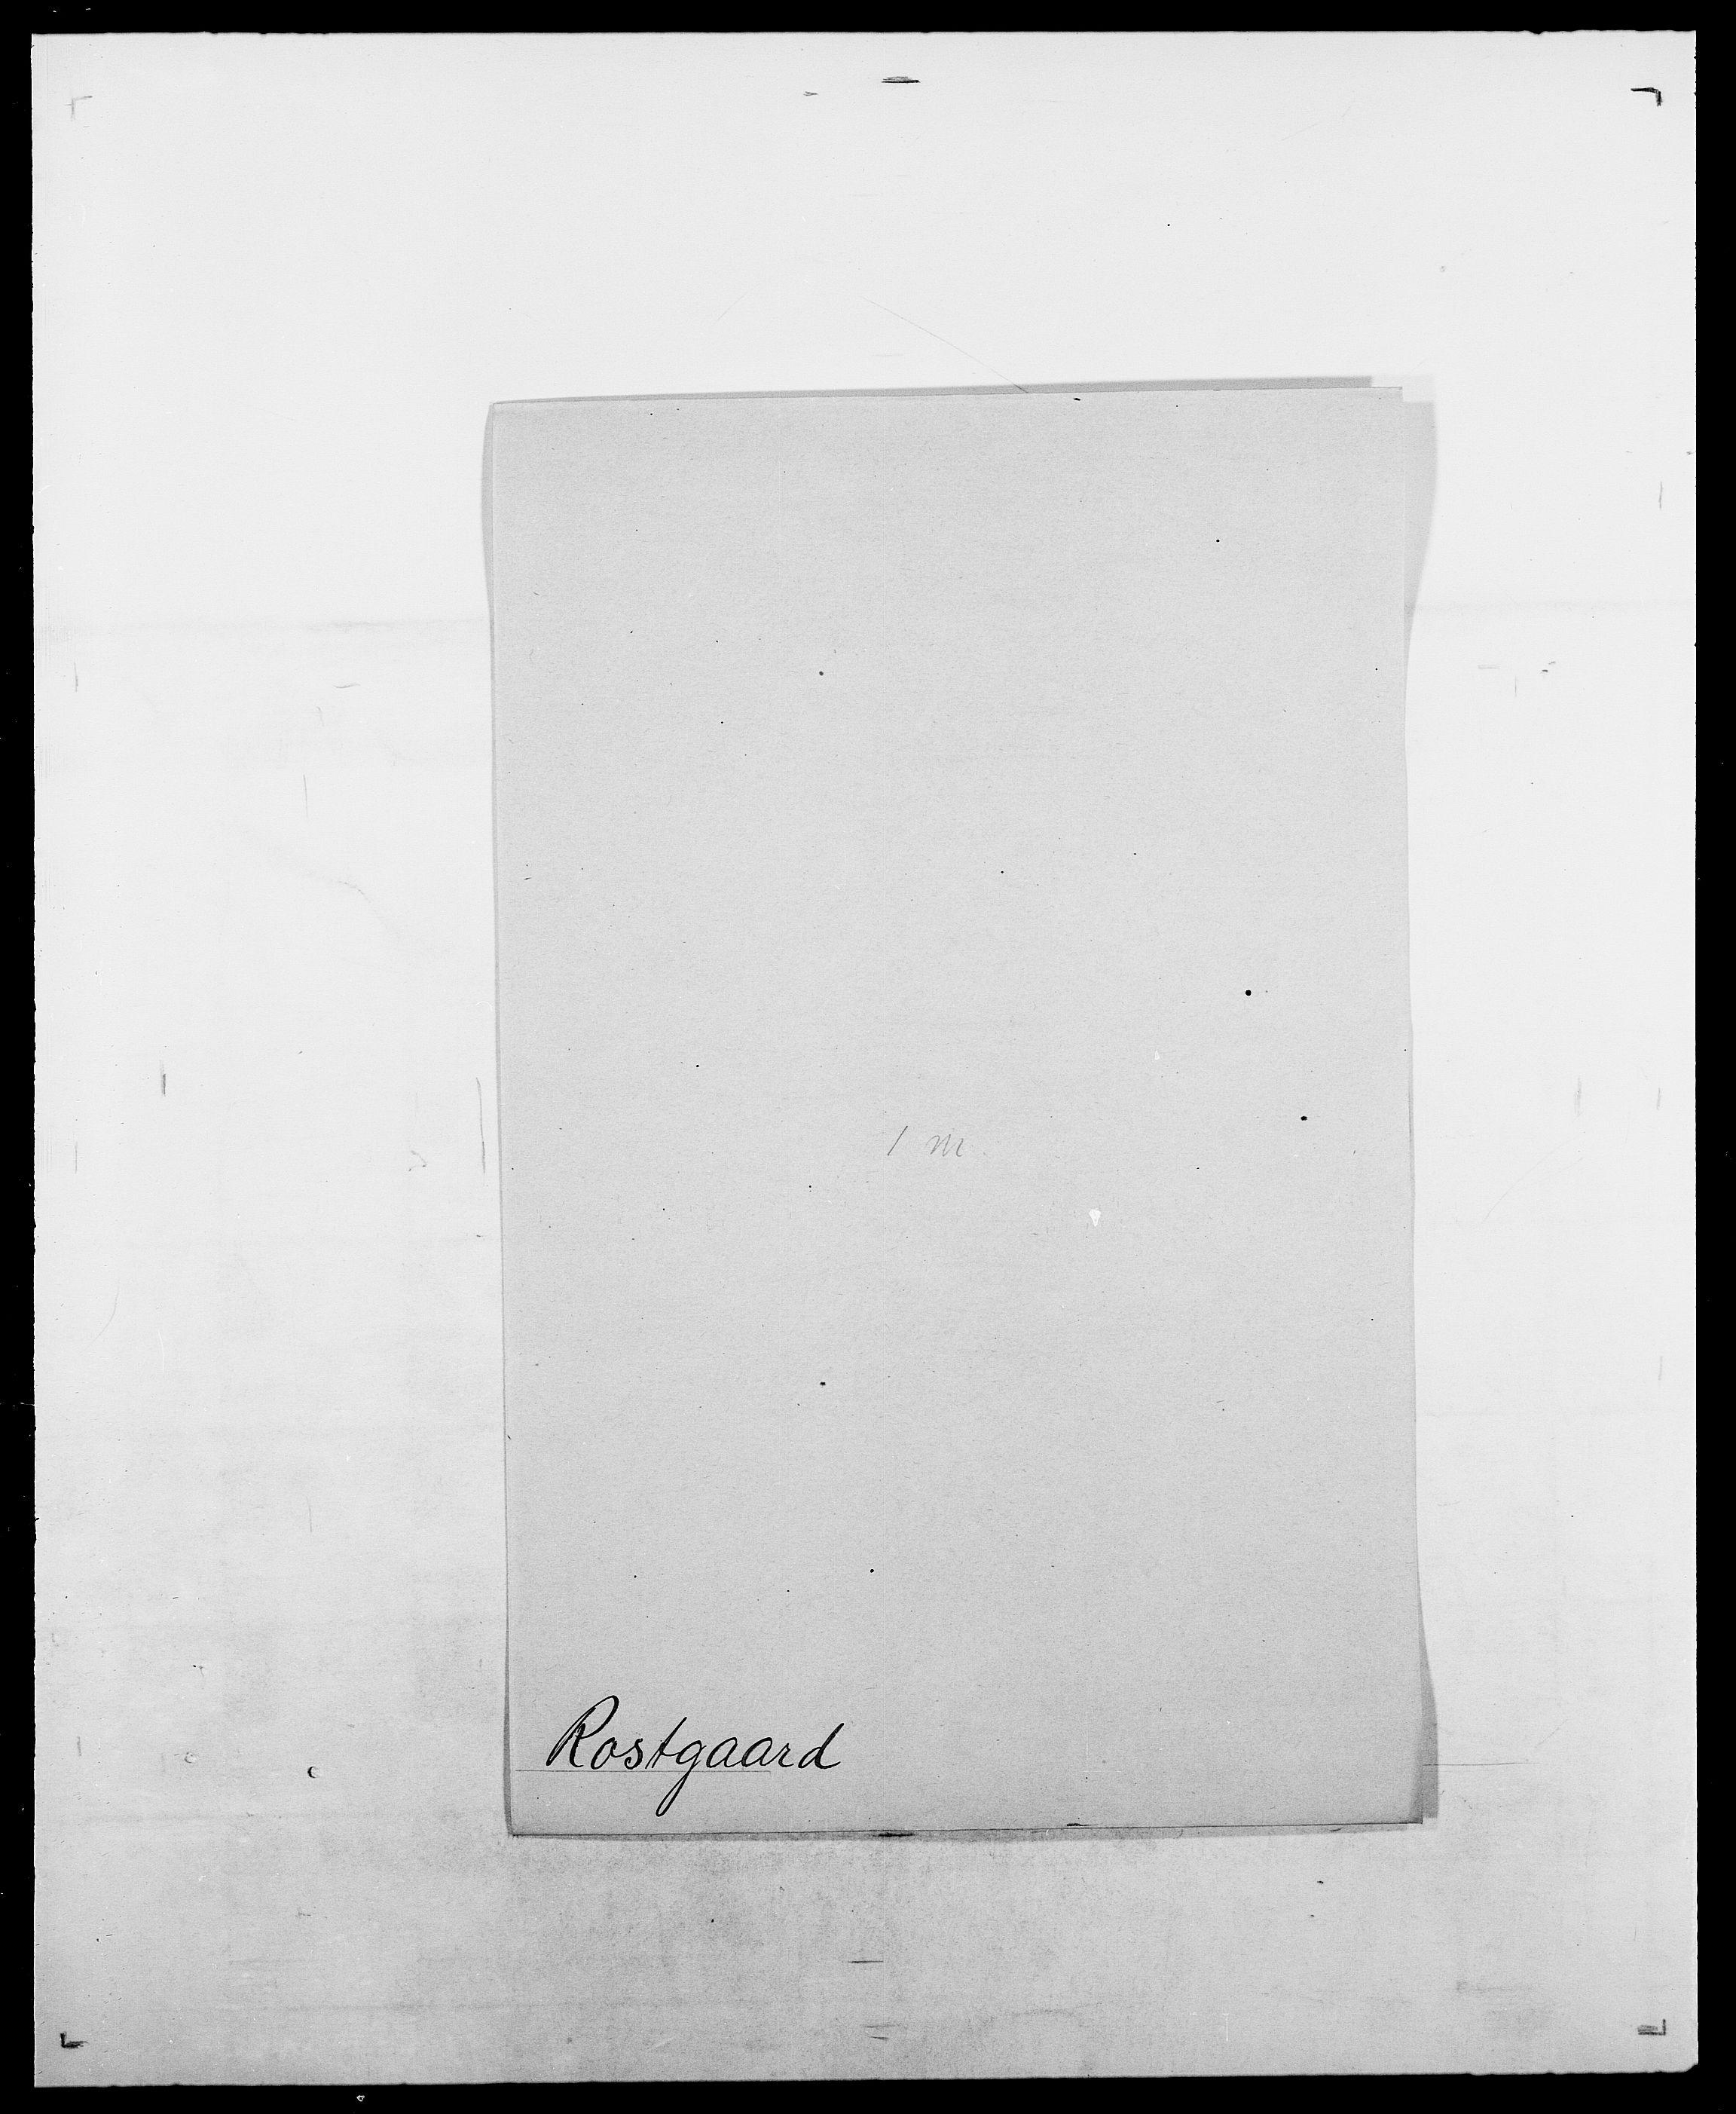 SAO, Delgobe, Charles Antoine - samling, D/Da/L0033: Roald - Røyem, s. 364